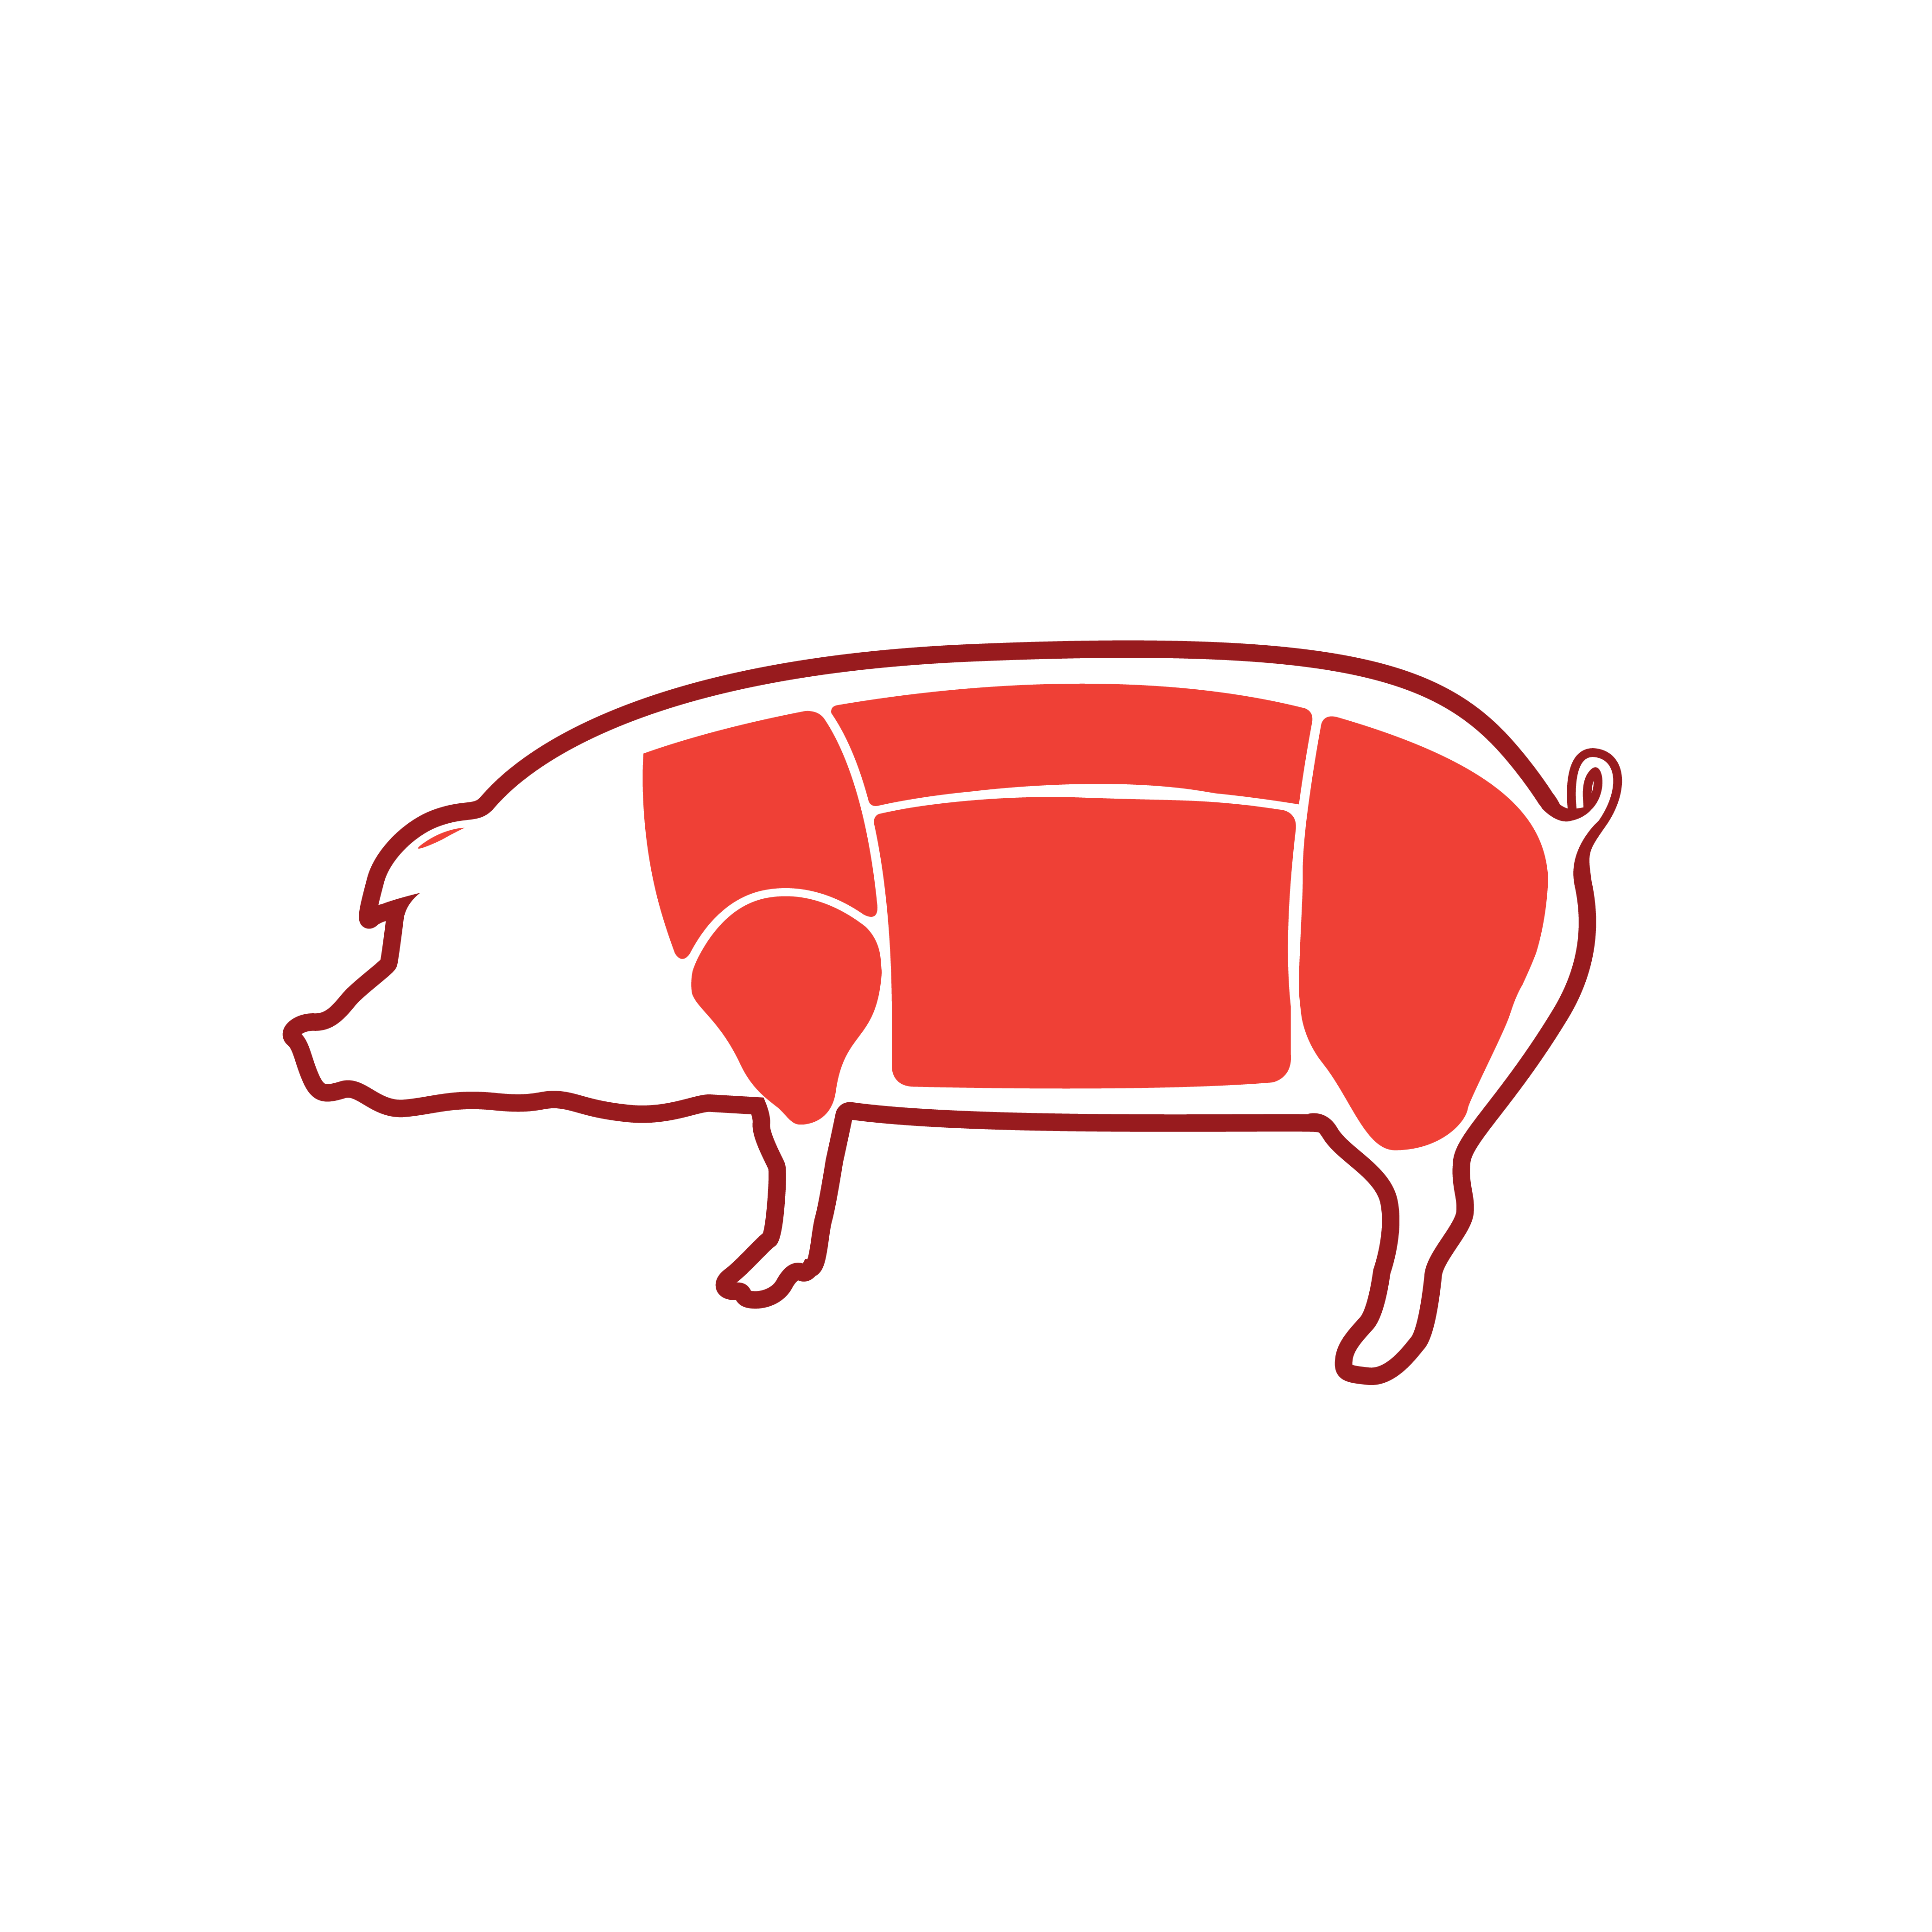 6_Conoce tu carne_Cerdo-04